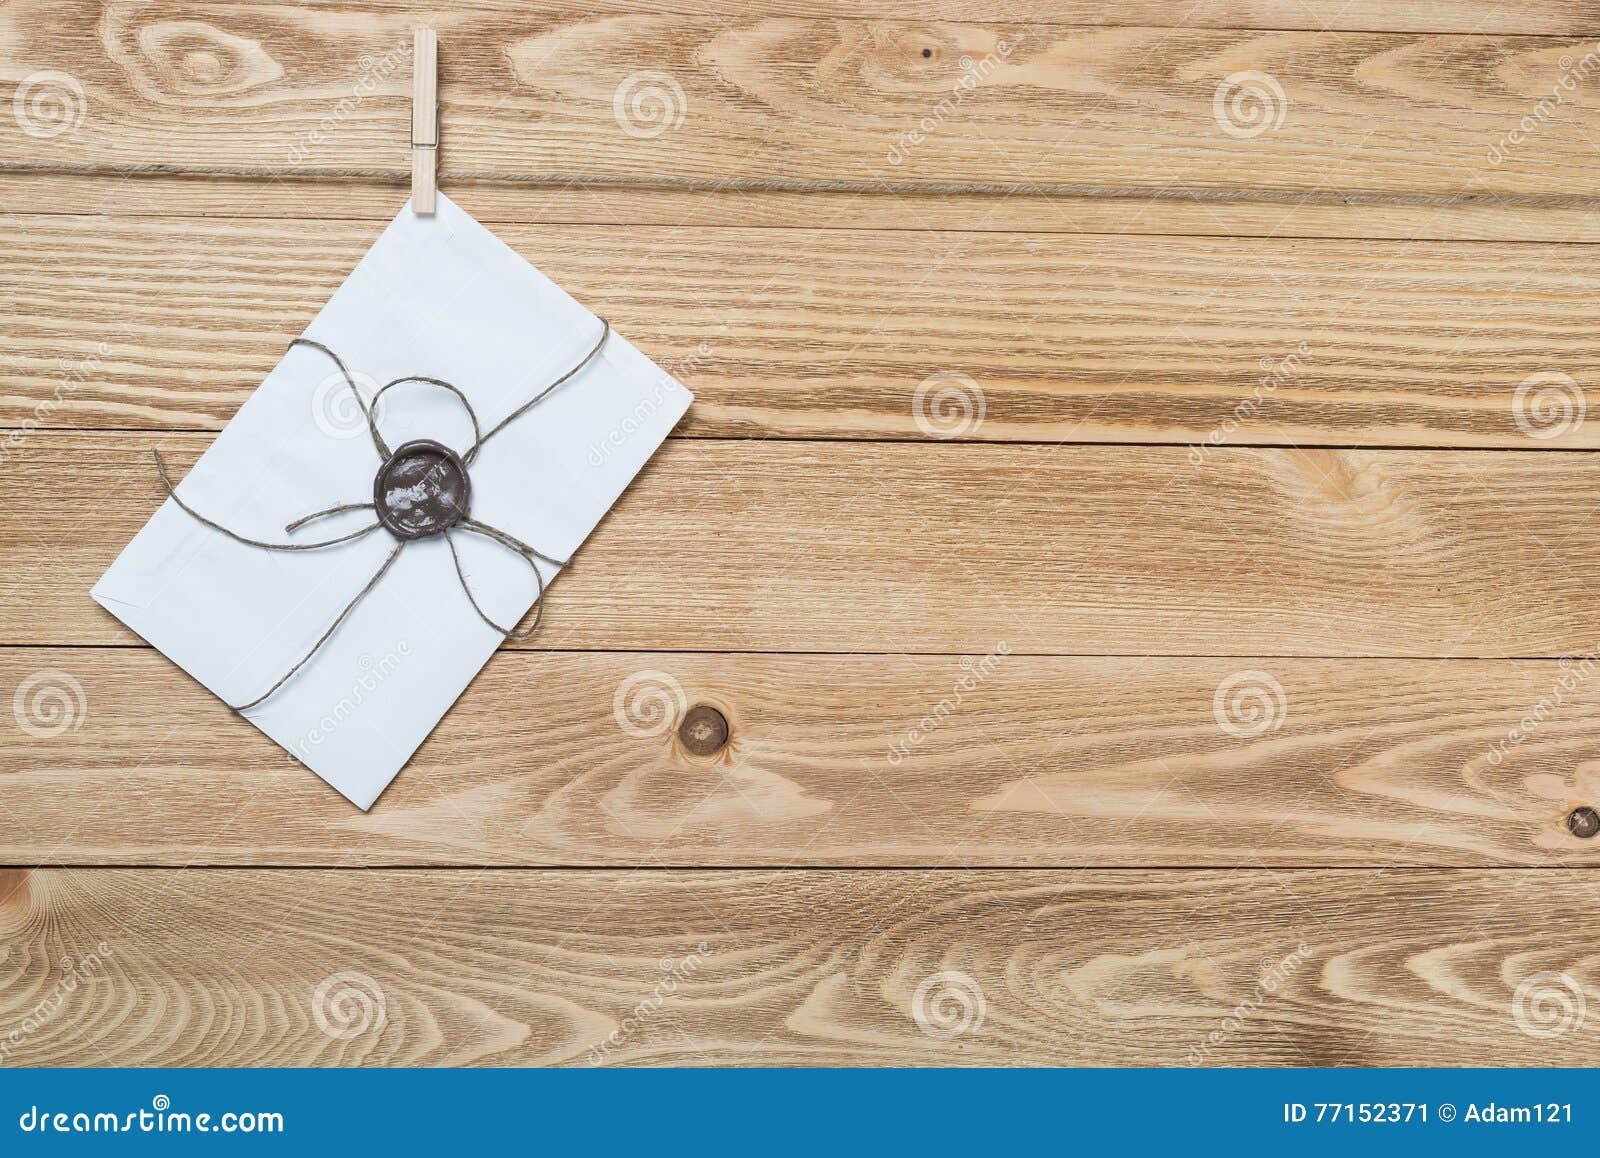 Enveloppe de courrier sur la corde